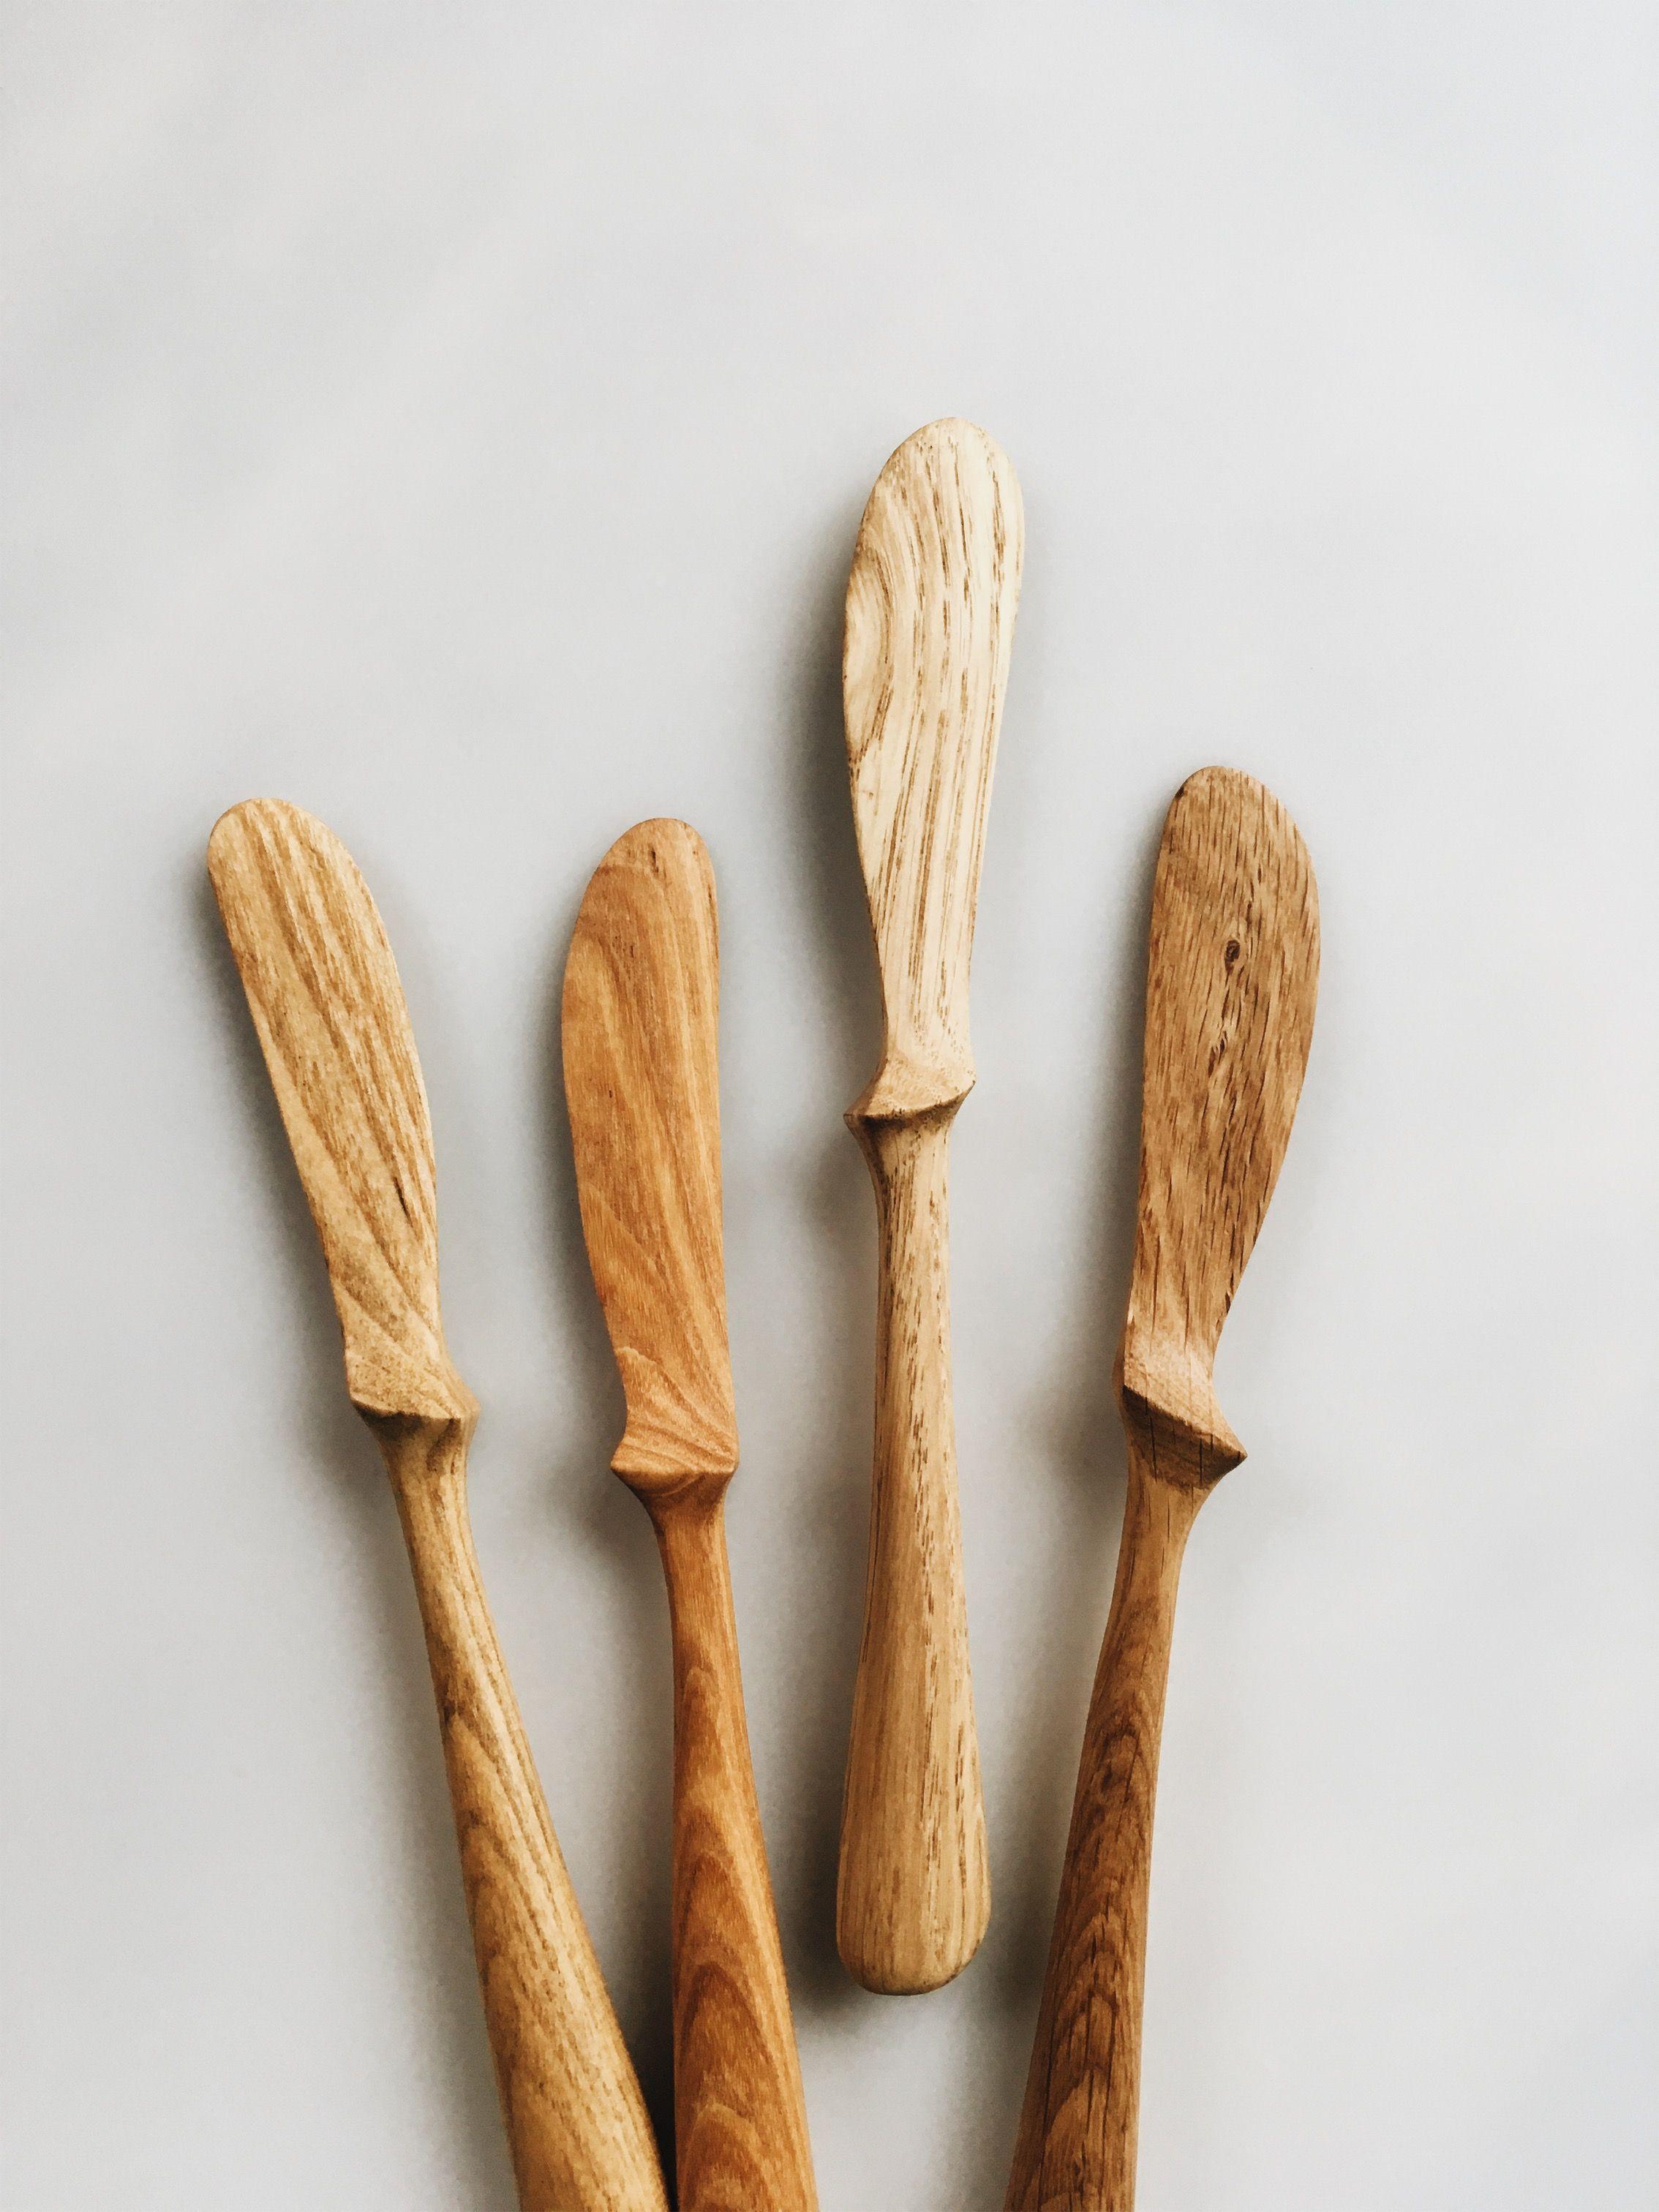 Handmade Wooden Spreading Knife Walnut Butter Knife Wooden Etsy Wooden Spoon Carving Wood Turning Butter Knife